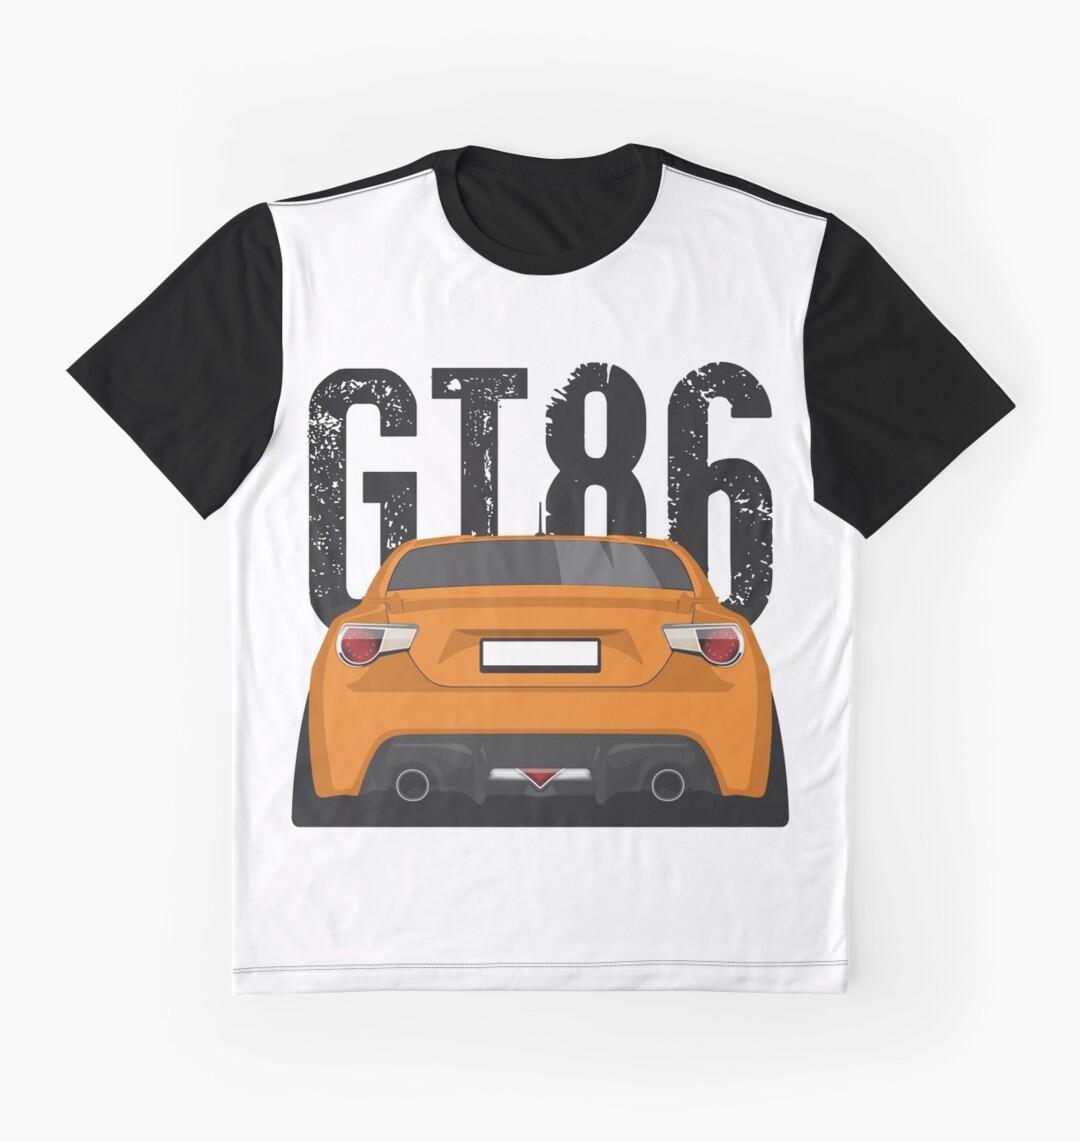 Gt86 design t shirts men s t shirt -  Toyota Gt86 Stance Car Graphic T Shirts